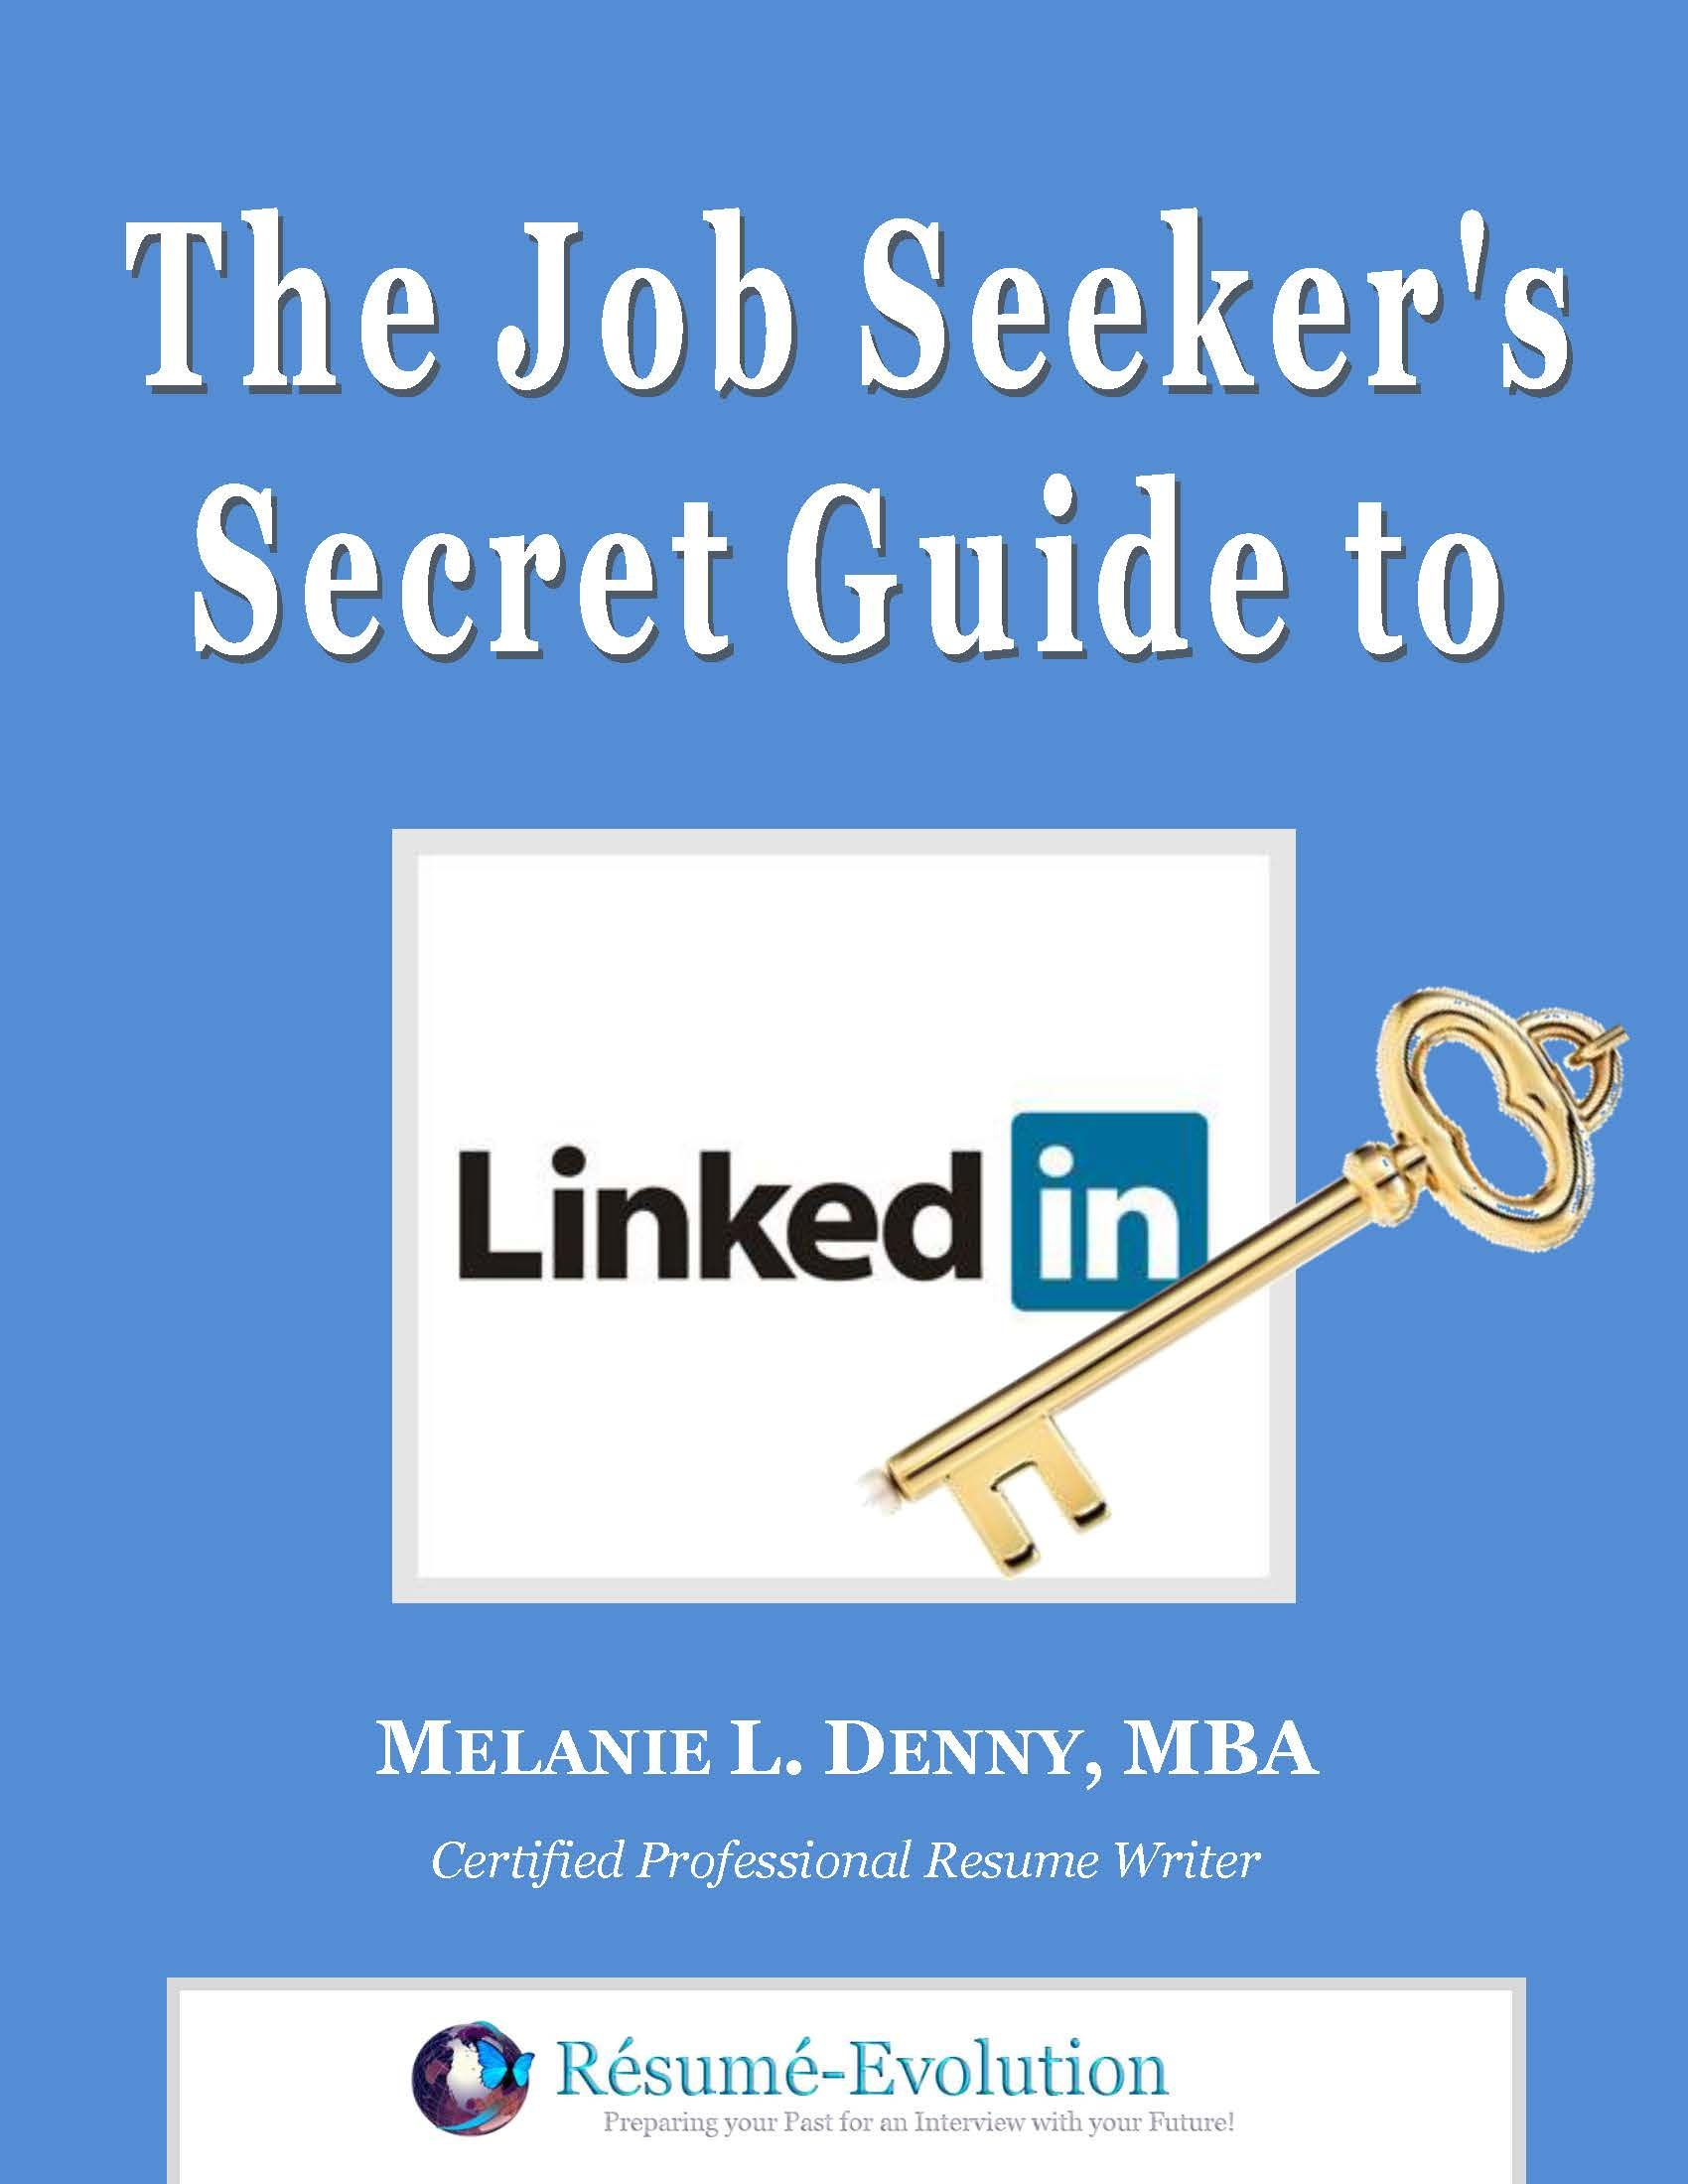 Online resume writing service jobs